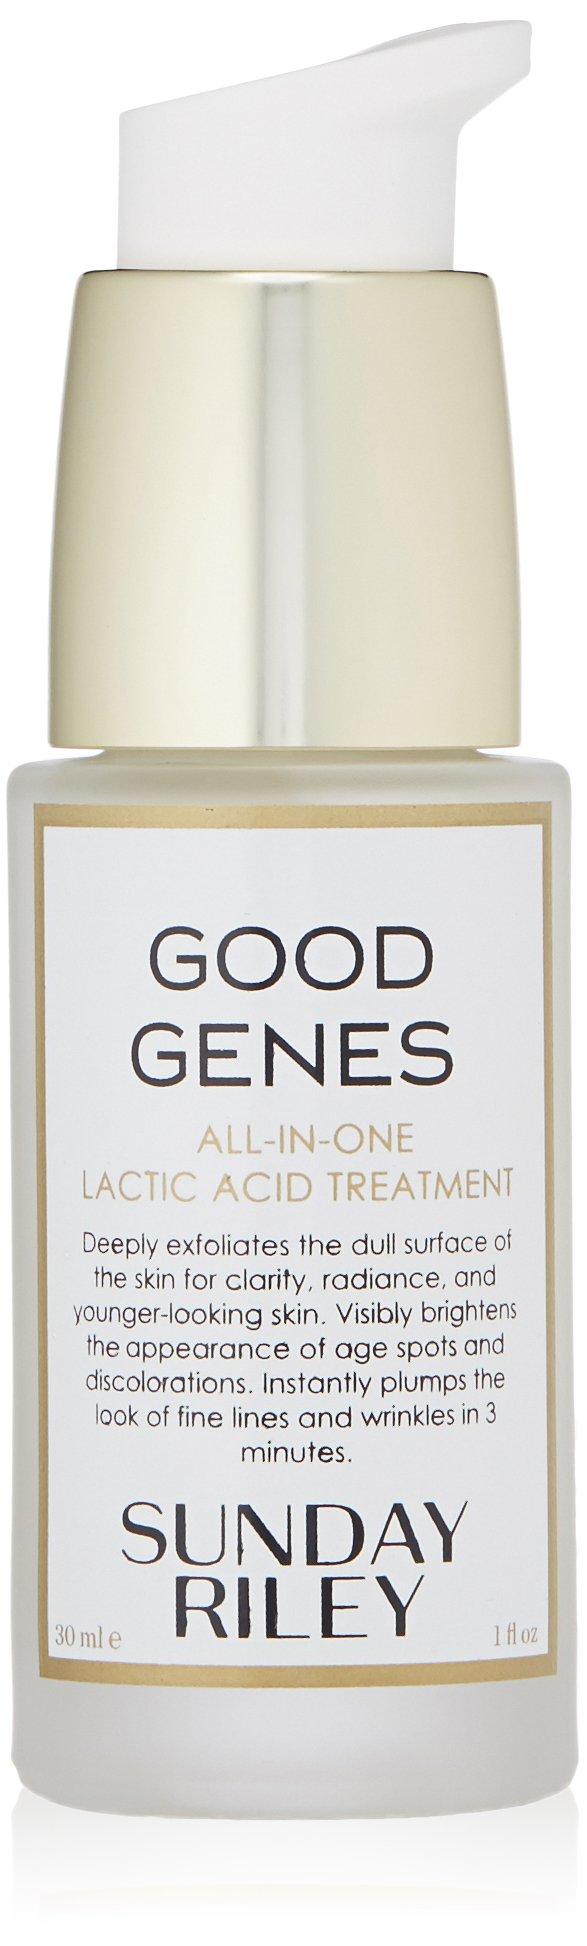 Sunday Riley Good Genes All-in-One Lactic Acid Treatment, 1.0 fl. oz.